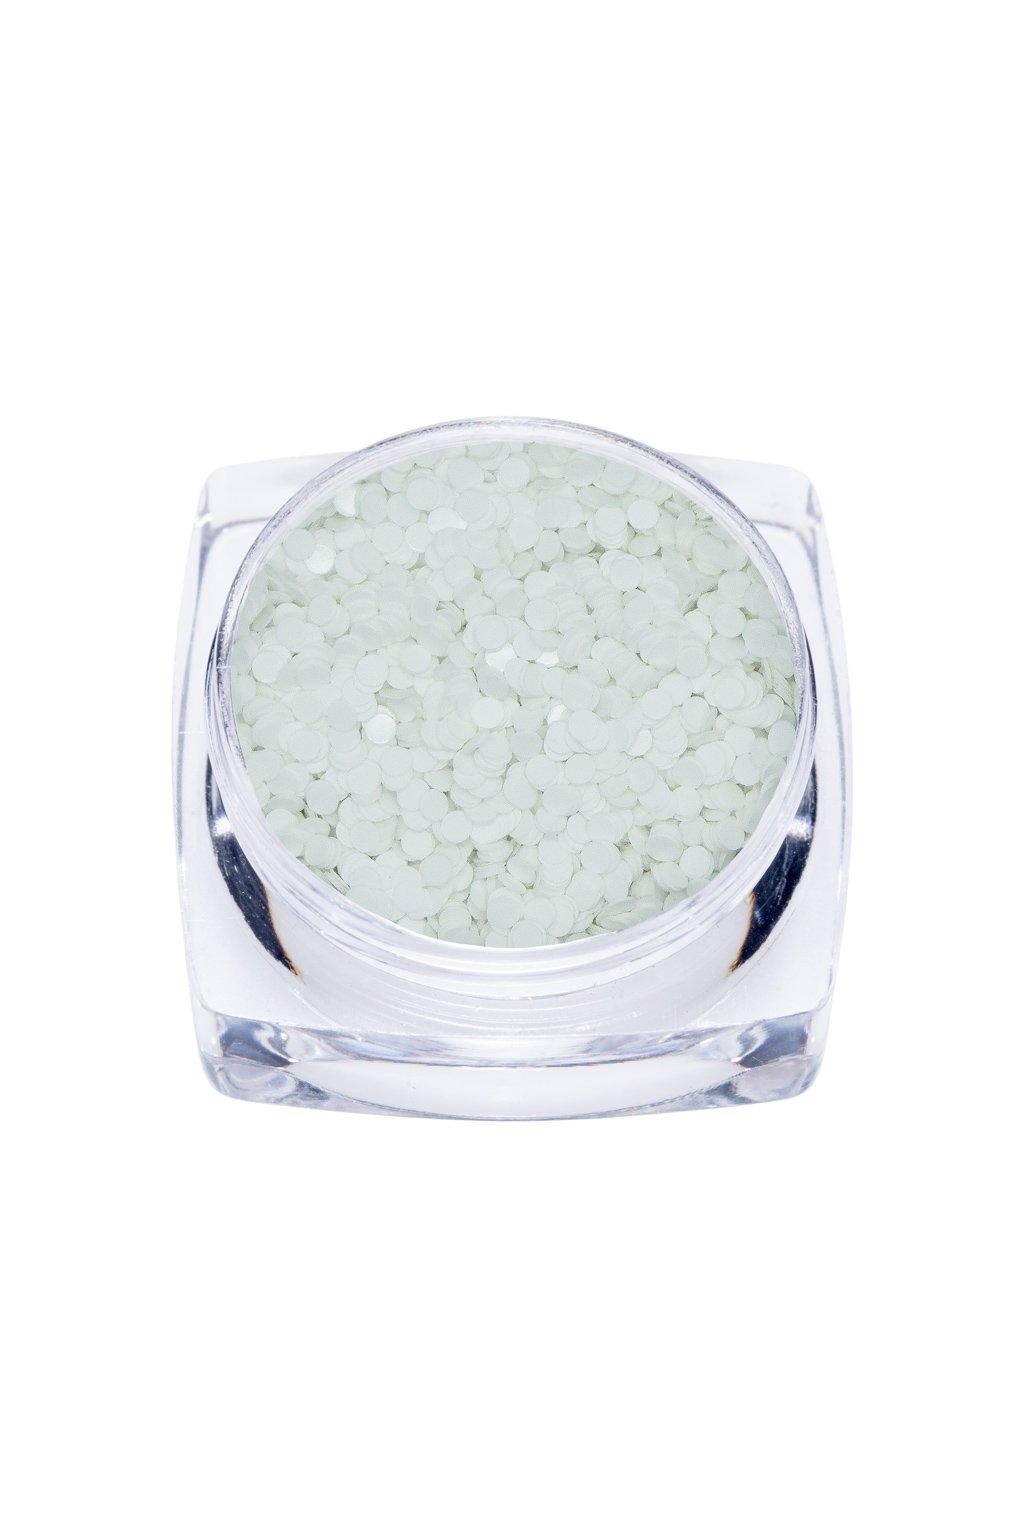 24017 minipihy white 1mm